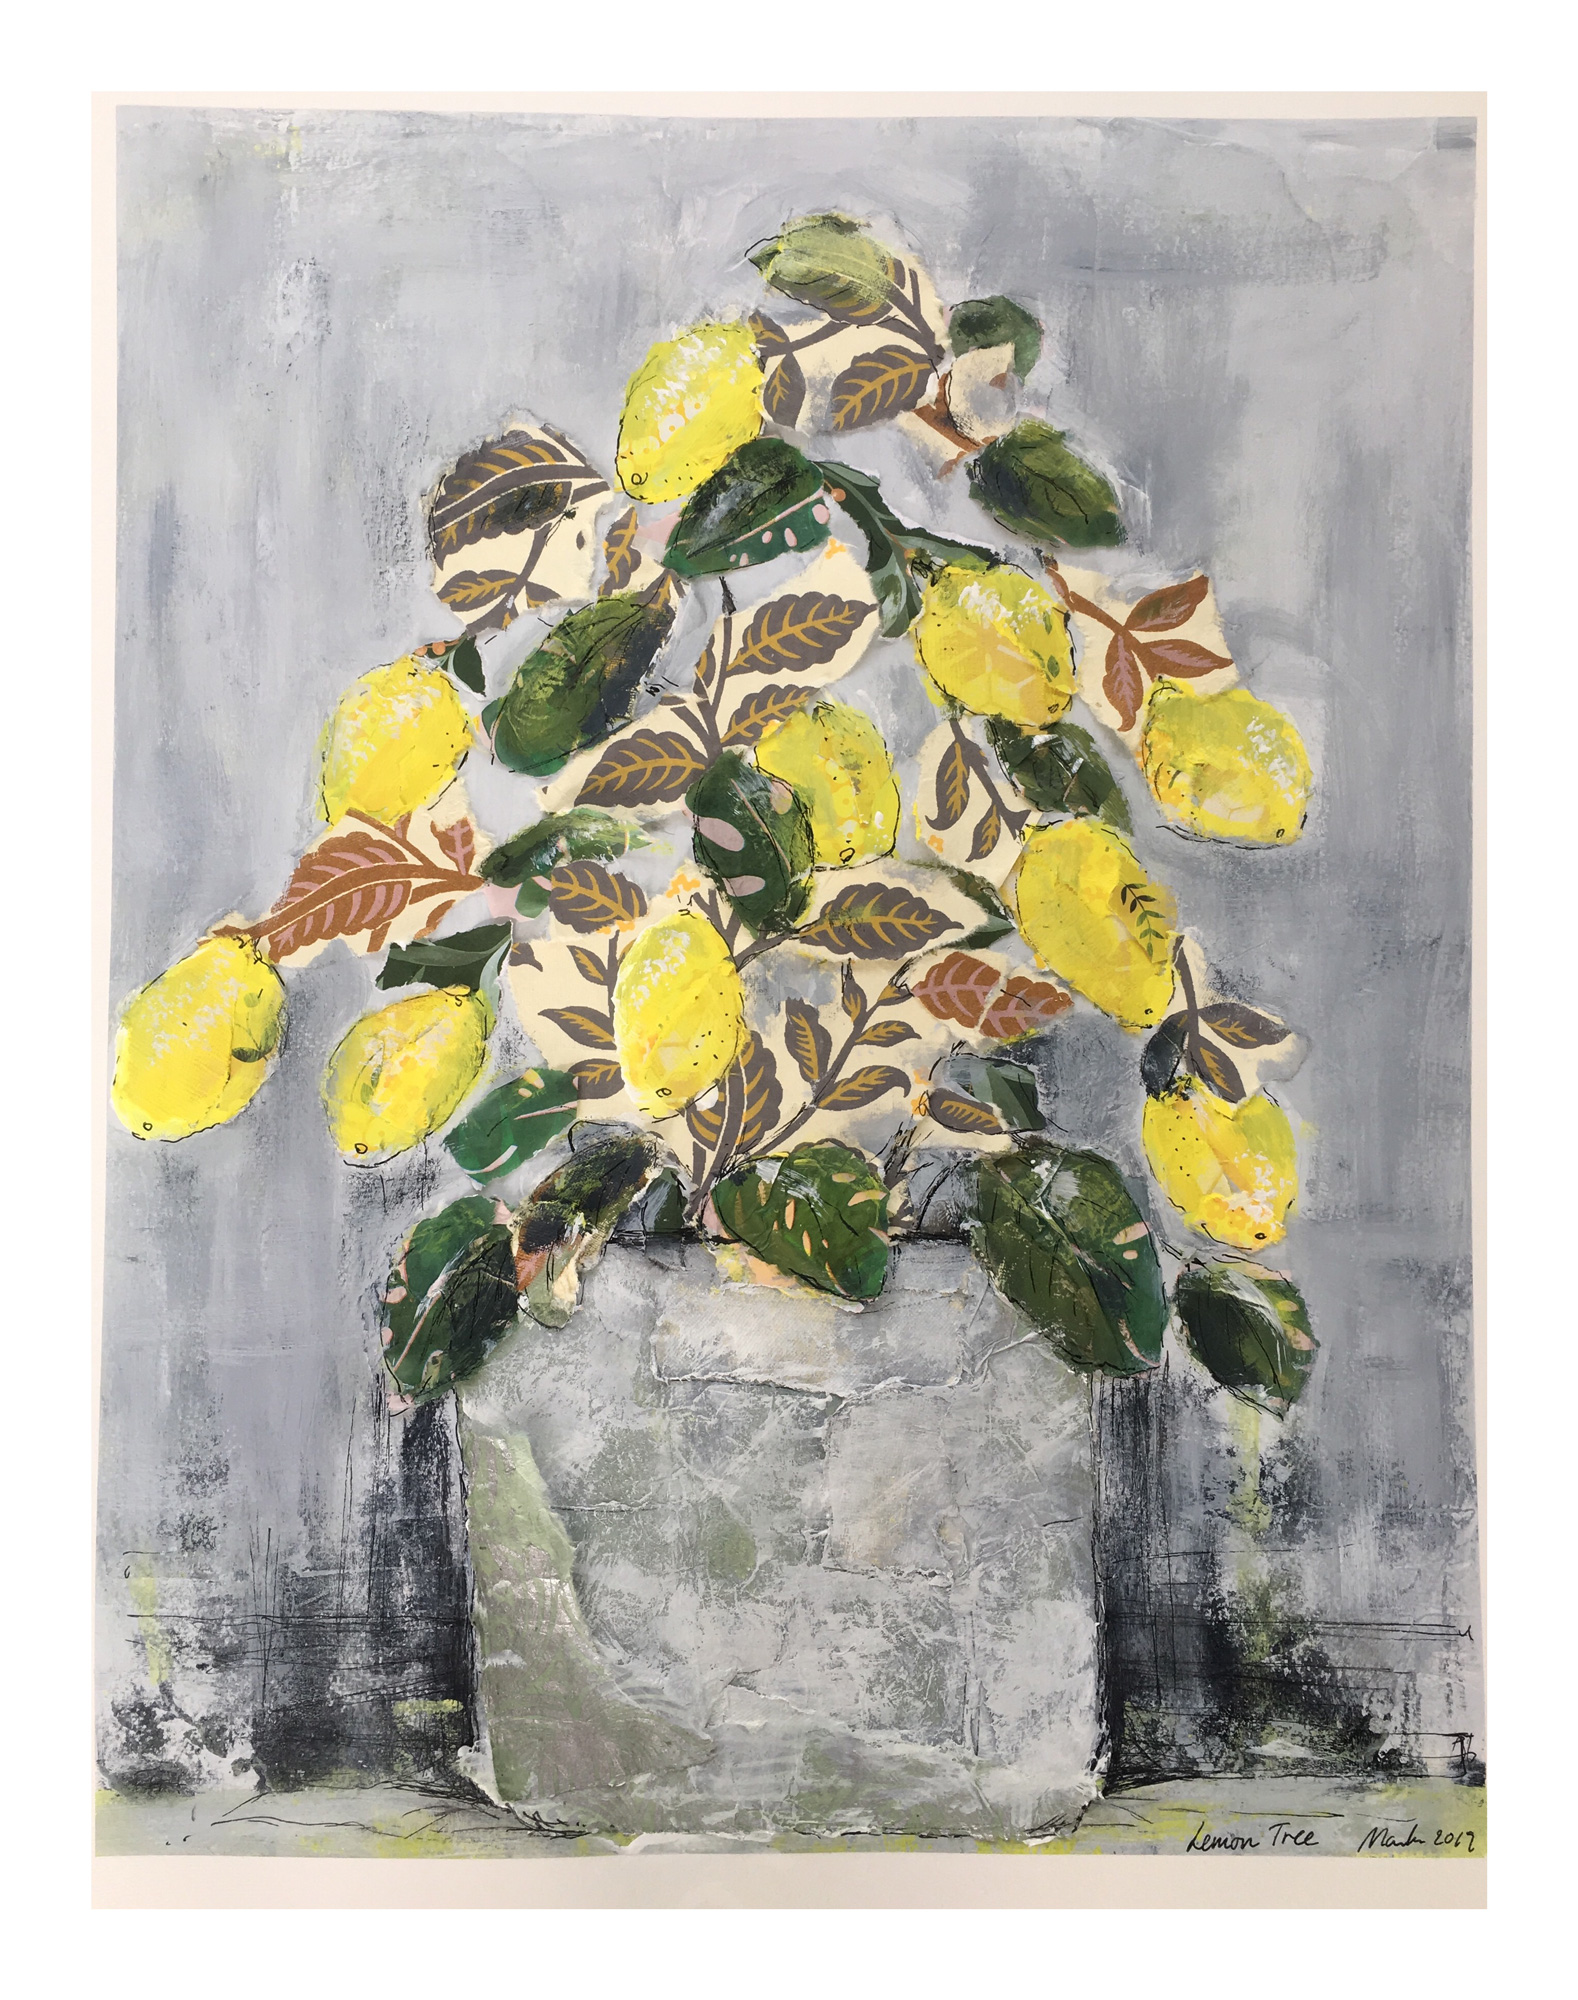 Marika Sonne | Lemon Tree | Mixed media | 40x50cm unframed | £150